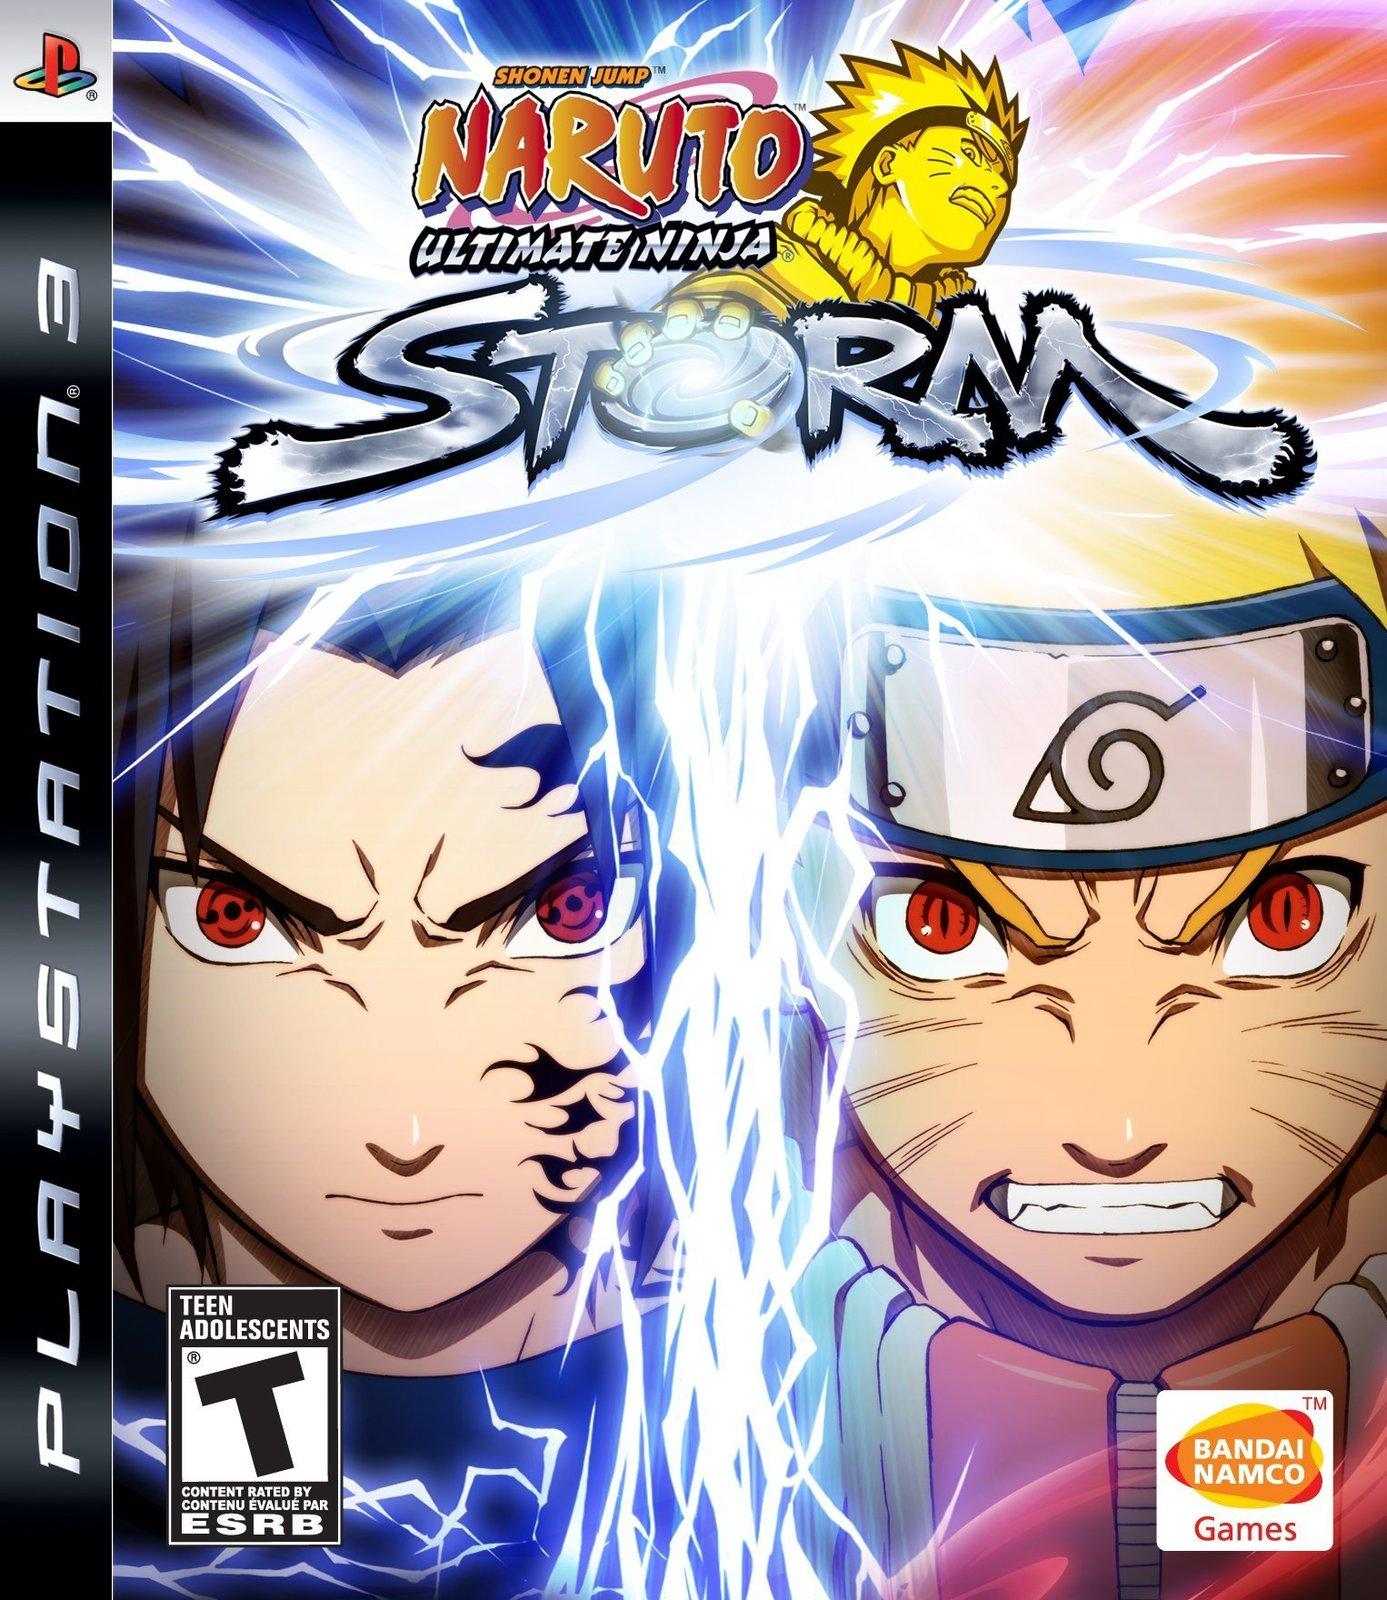 Naruto: Ultimate Ninja Storm | Narutopedia | Fandom powered by Wikia